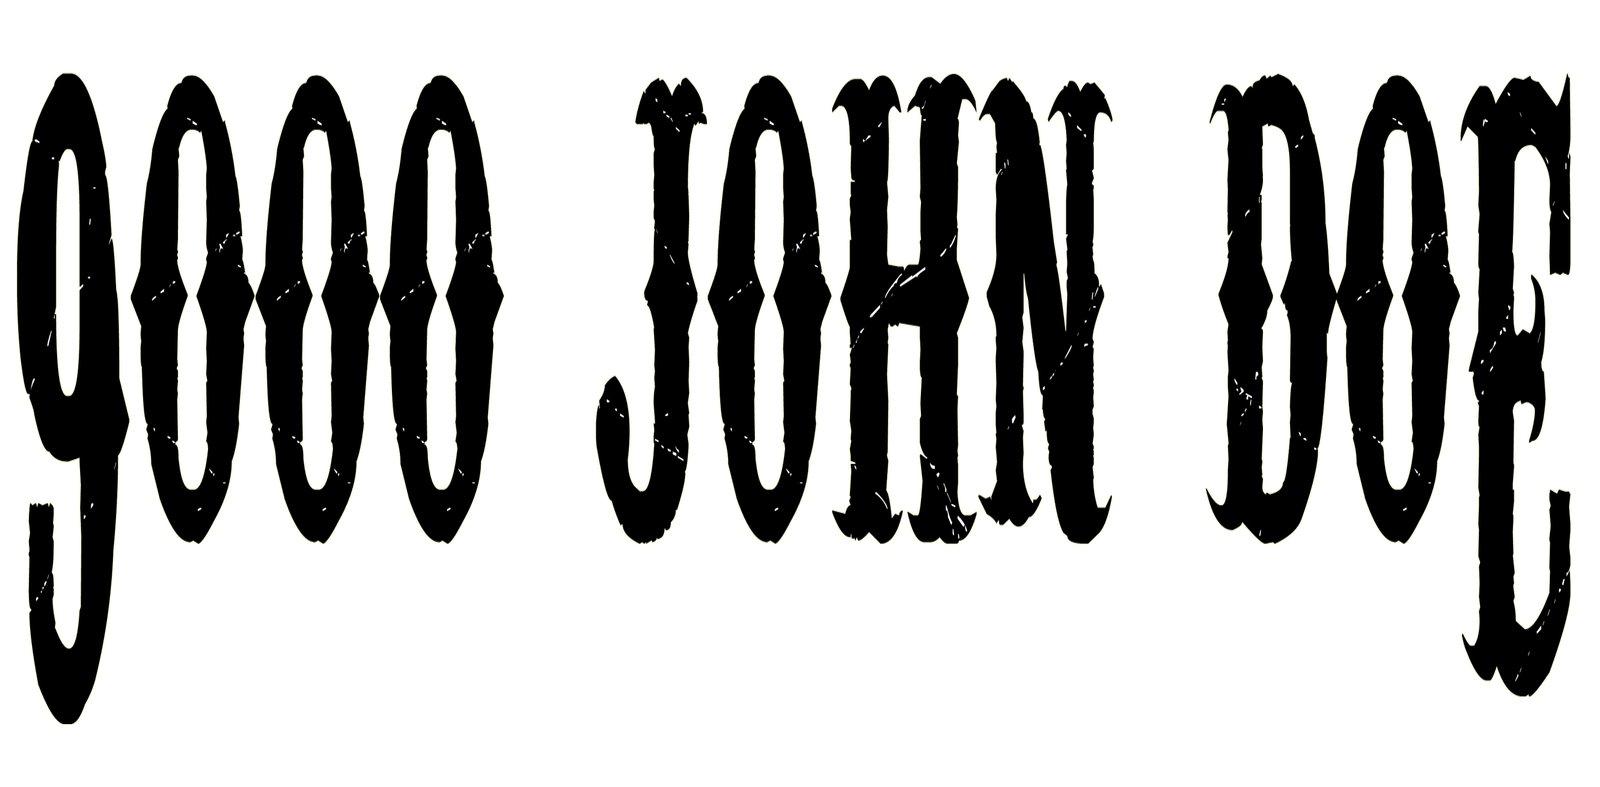 9000 John Doe